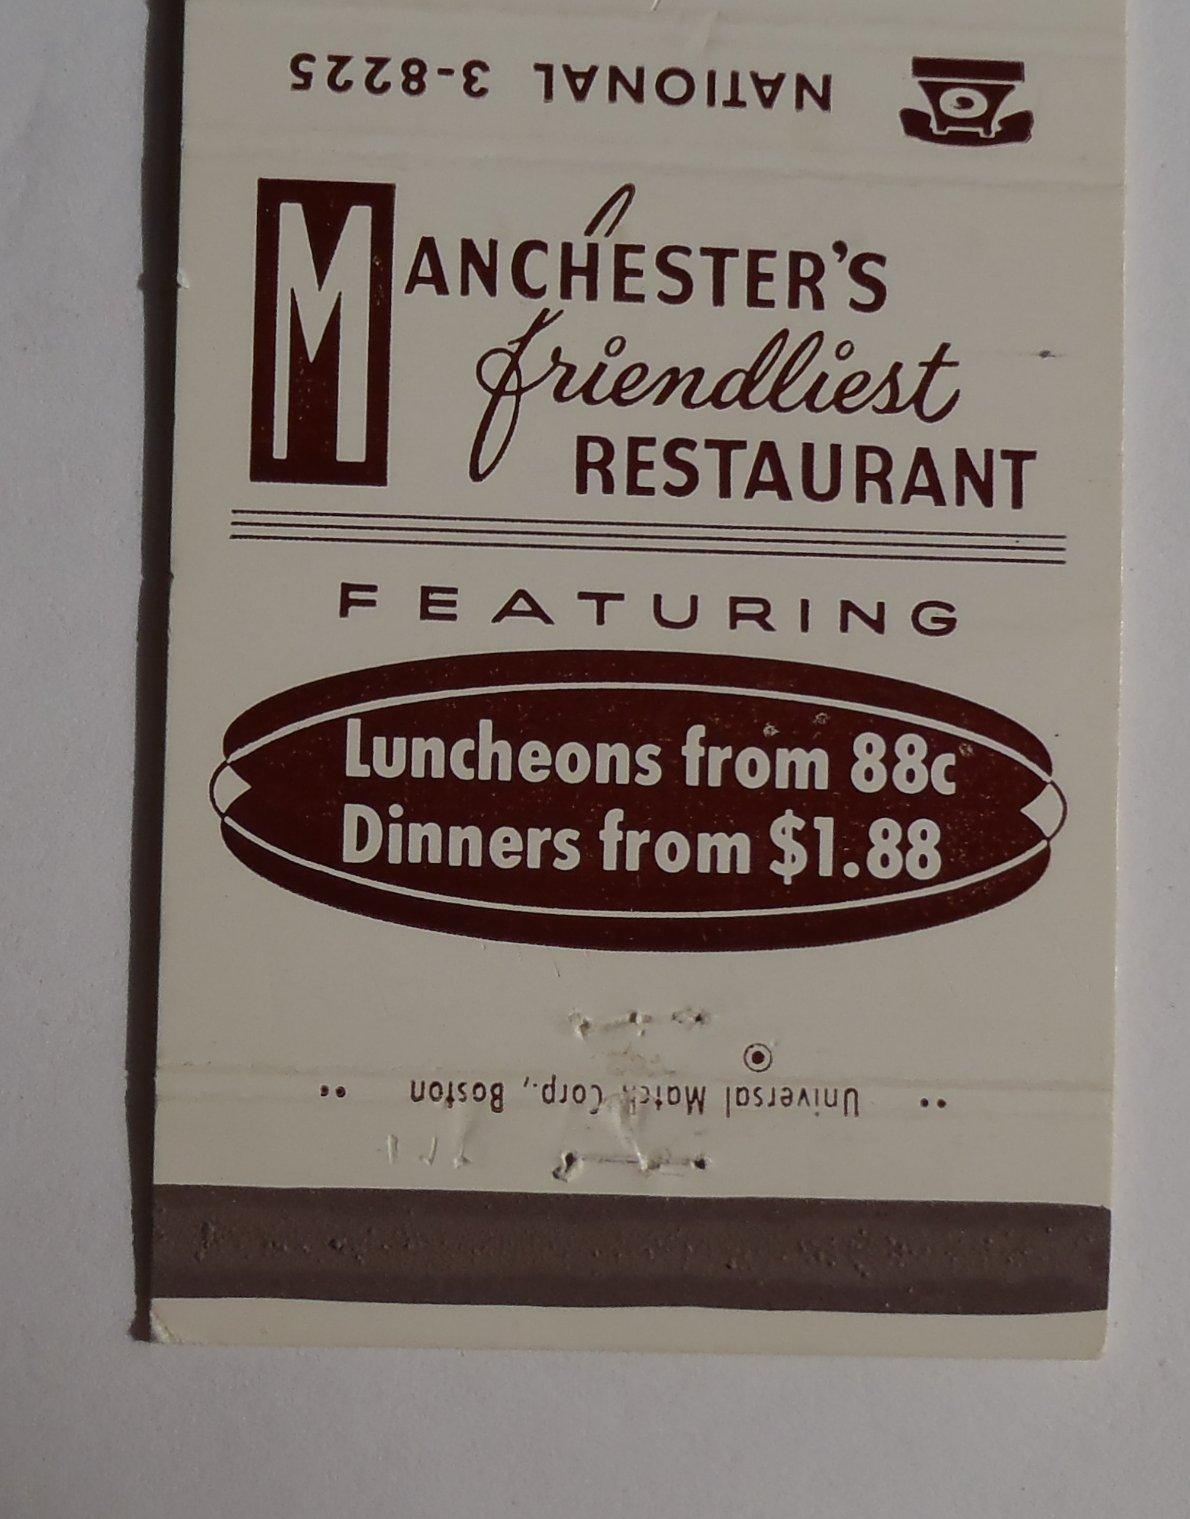 bluAqua Restrobar - 41 Photos & 10 Reviews - Southern - 930 Elm St, Manchester, NH - Restaurant